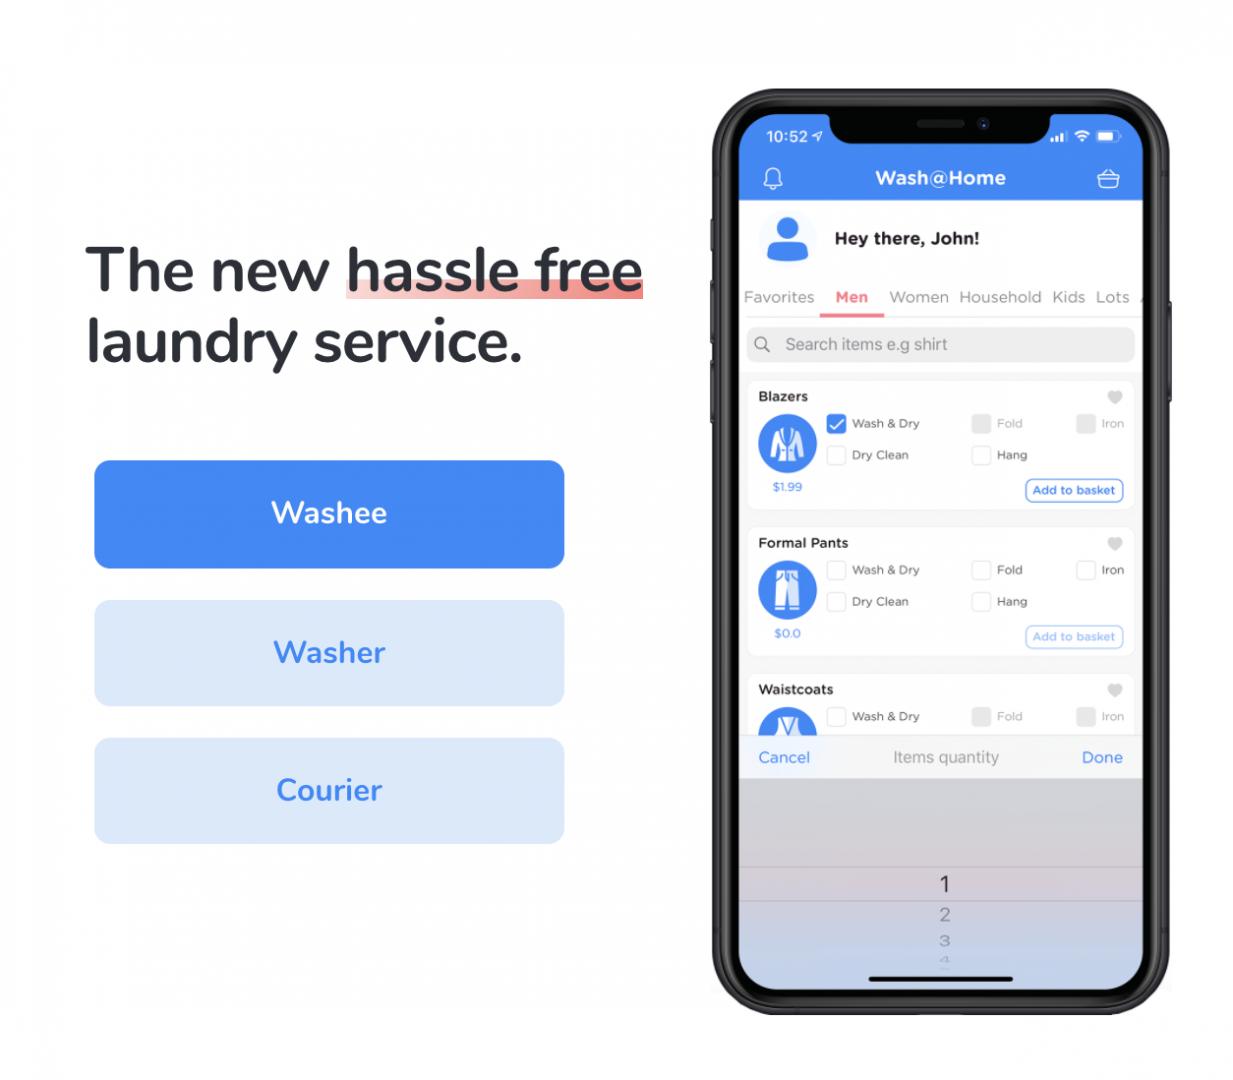 wash@home-app